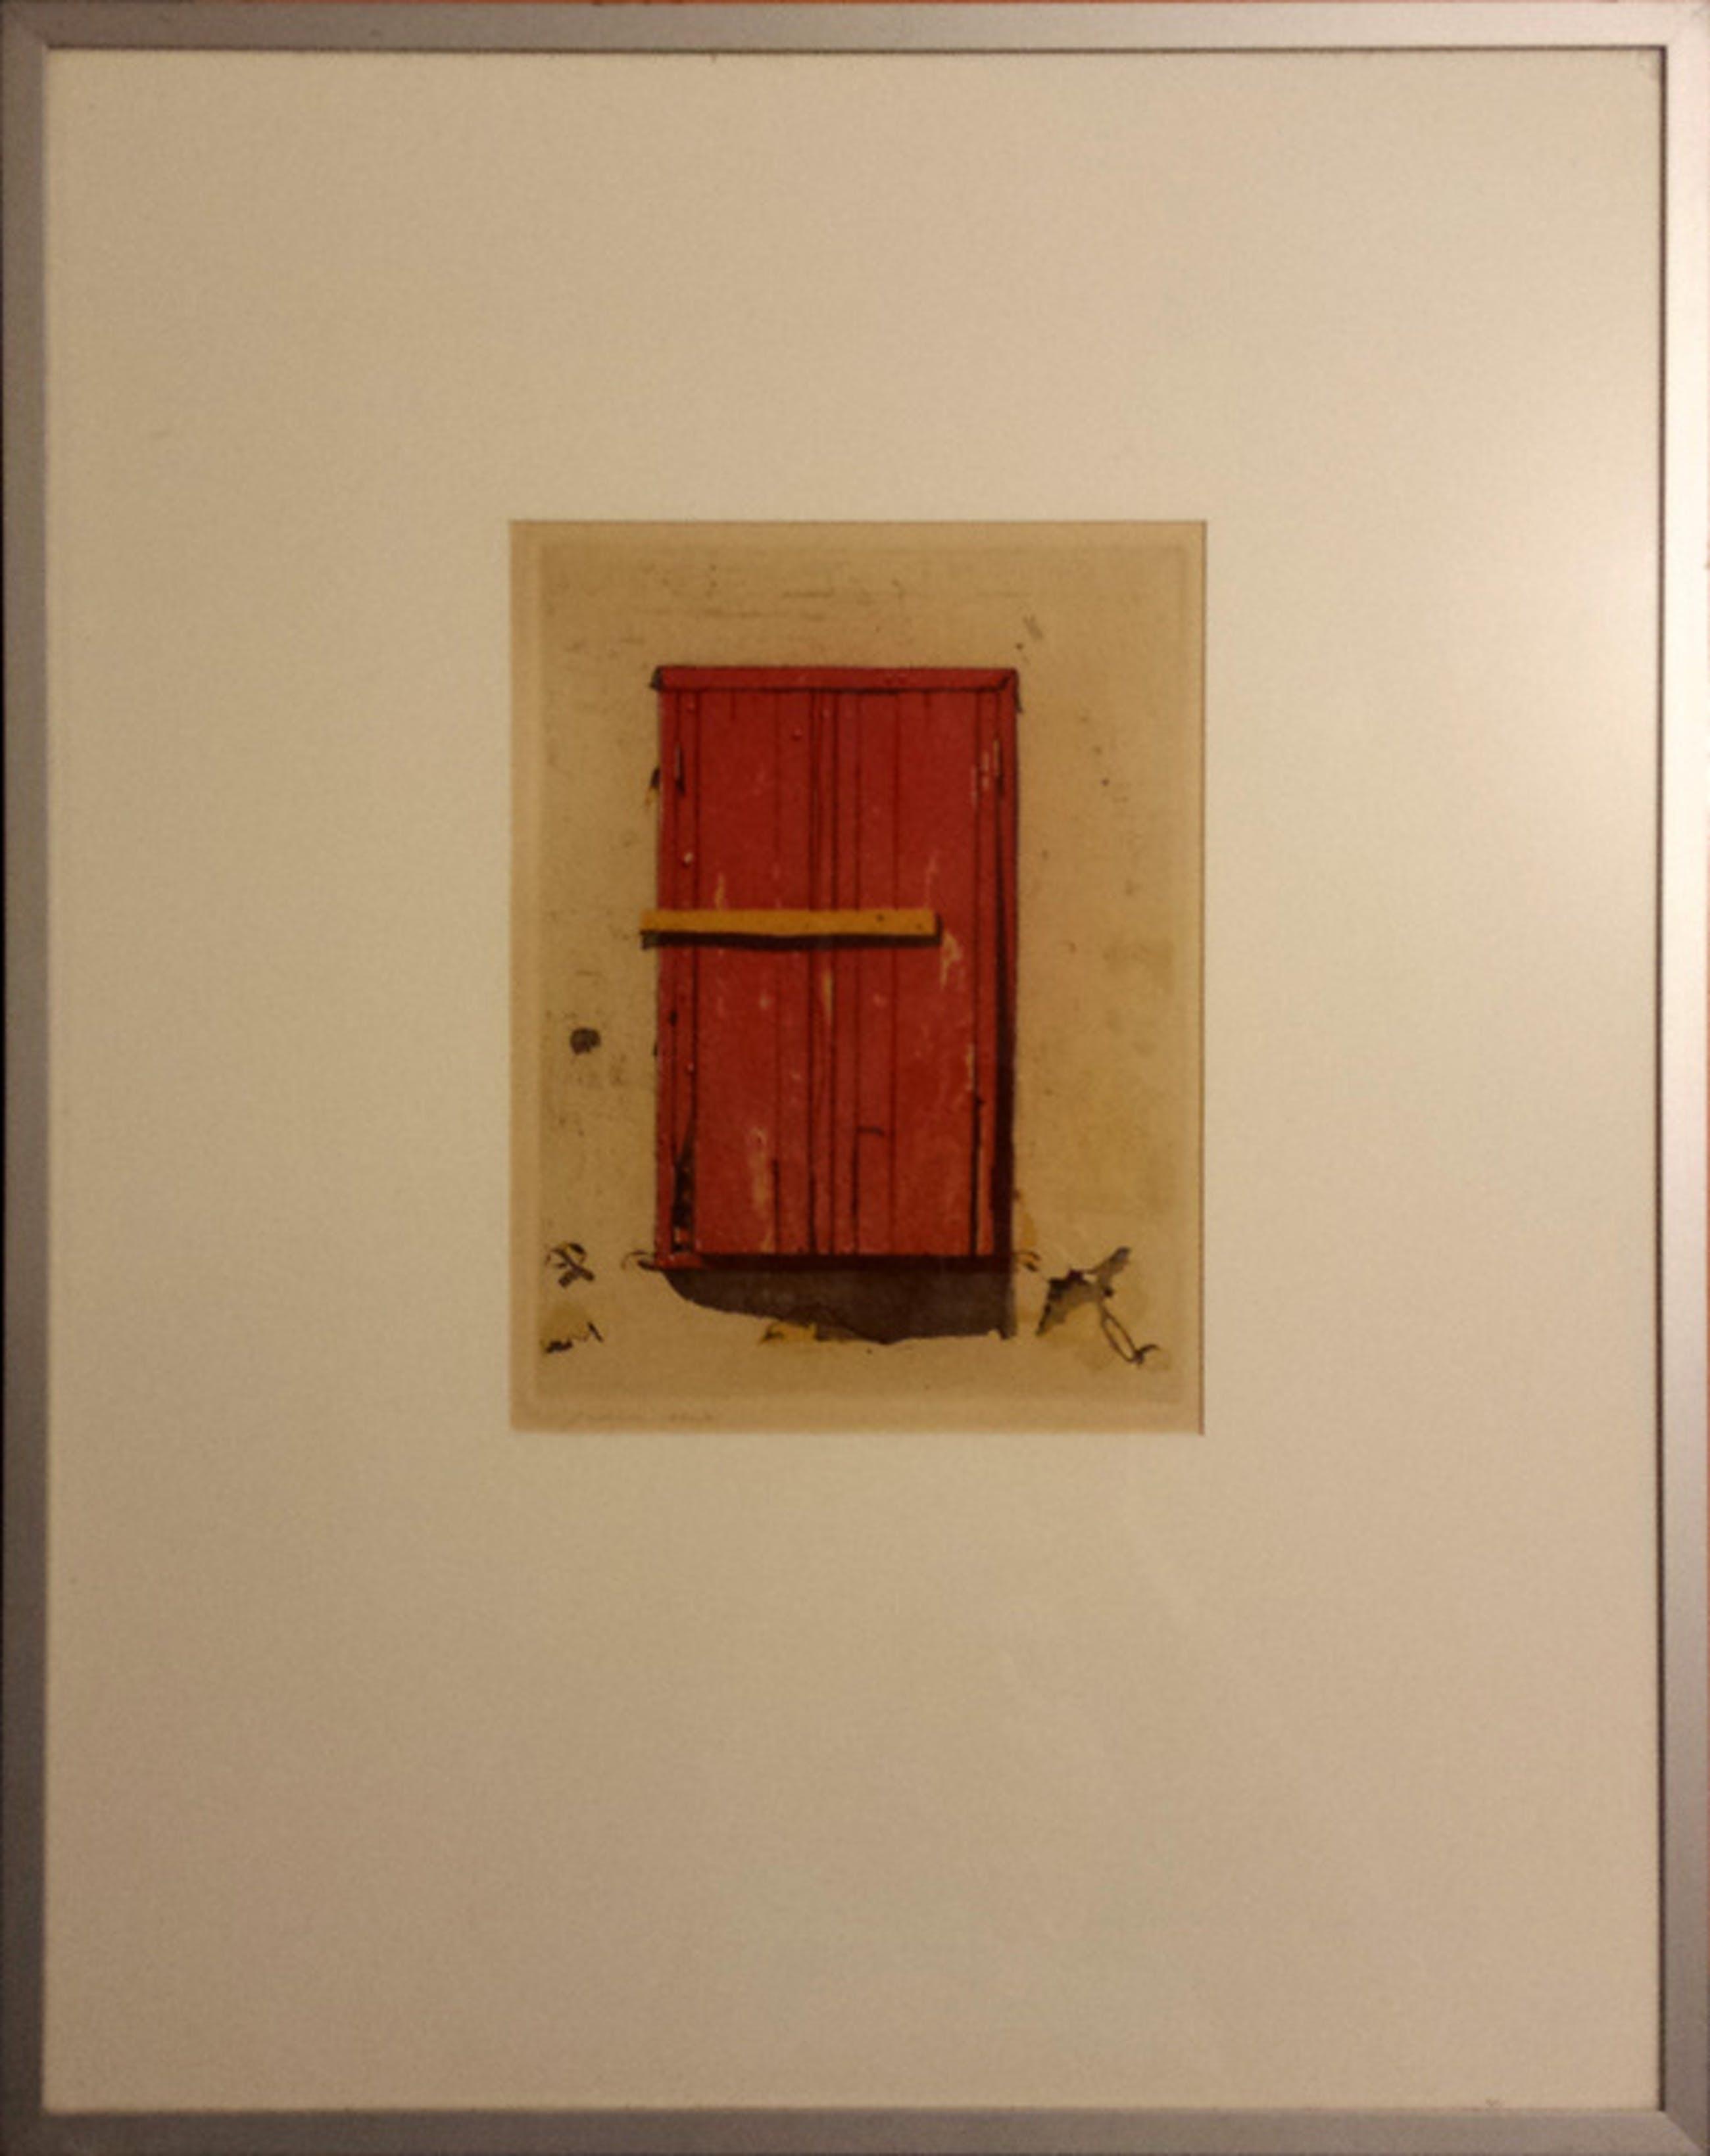 Kees Slegt, Ets nr 2, Calle que no paso, 1980 kopen? Bied vanaf 5!